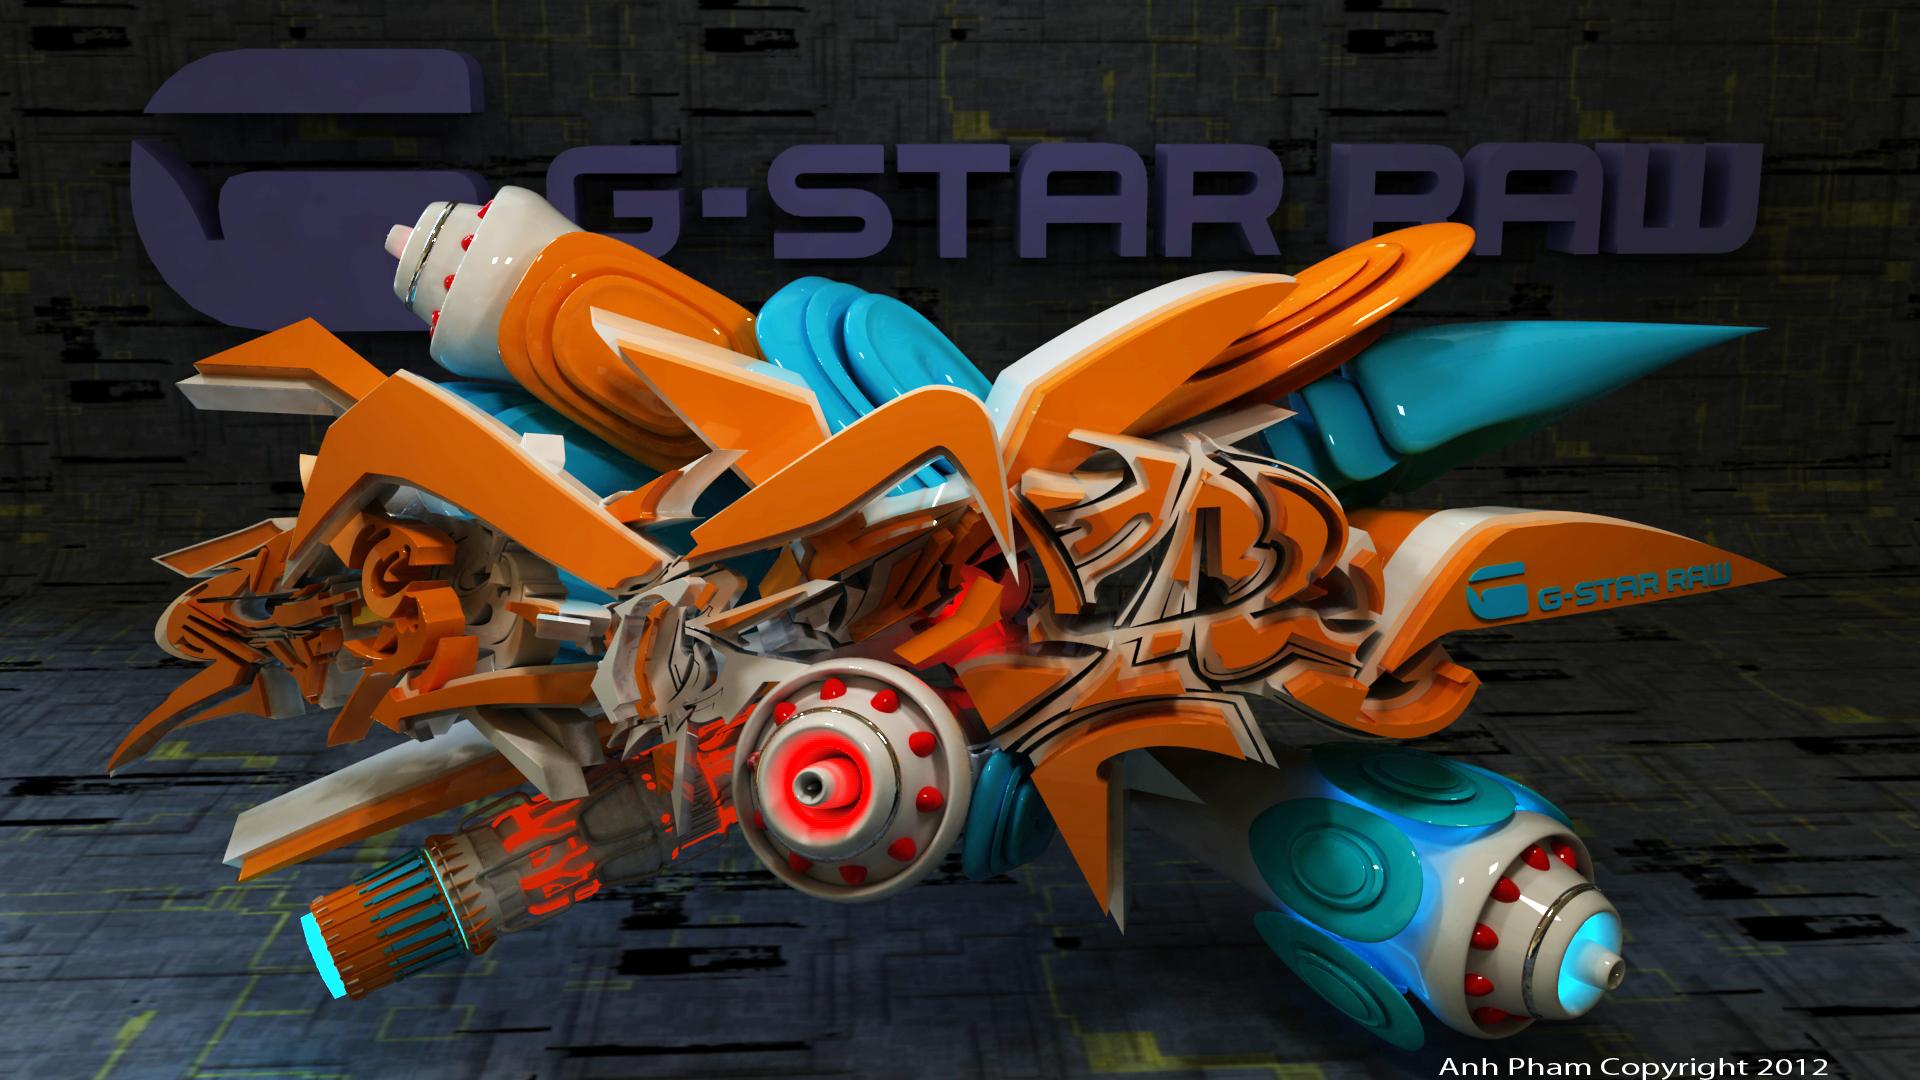 G star raw 3d graffiti by anhpham88 on deviantart for 3d art maker online